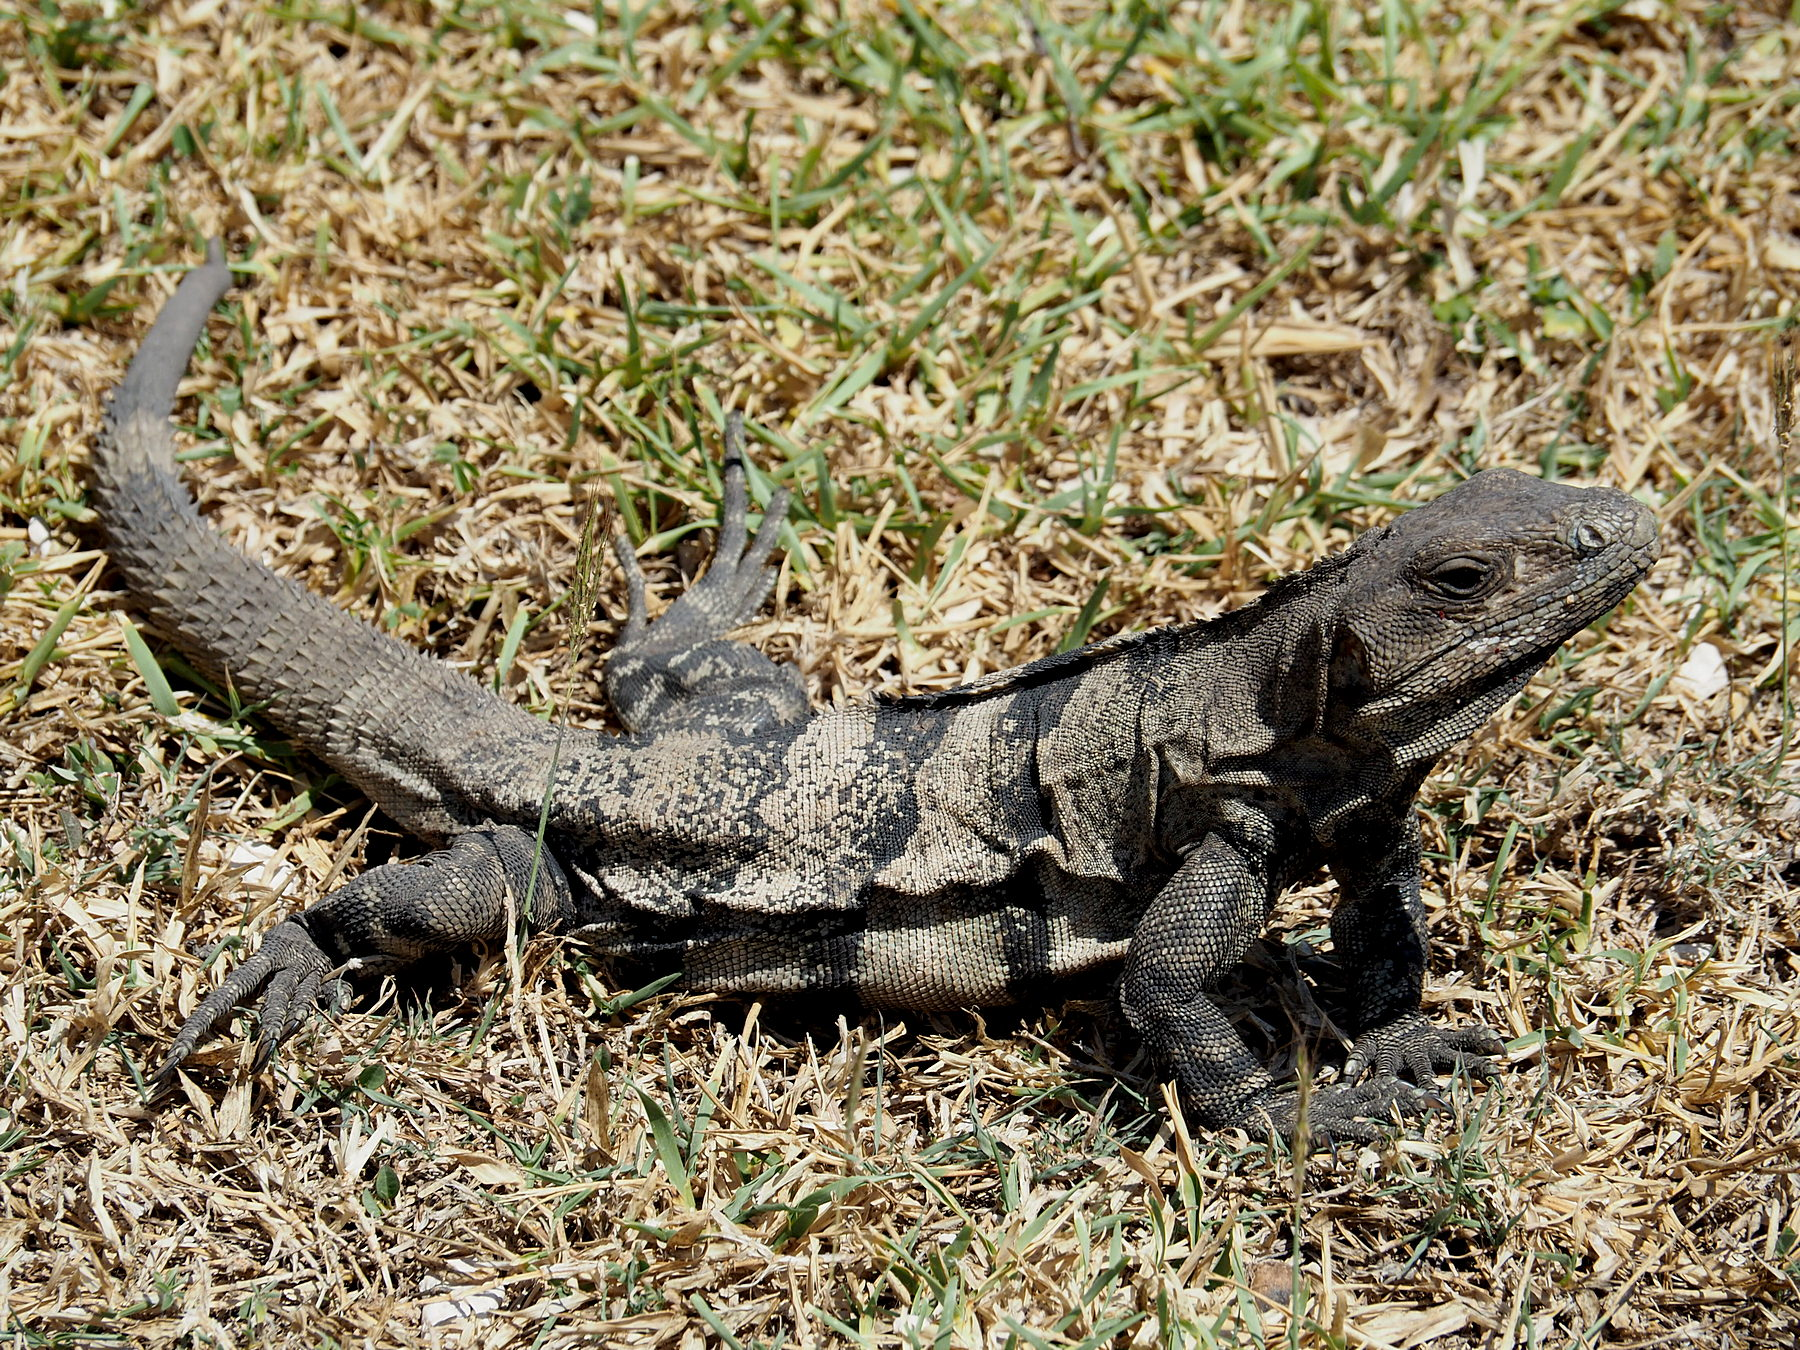 Standard-Leguan von Yucatan